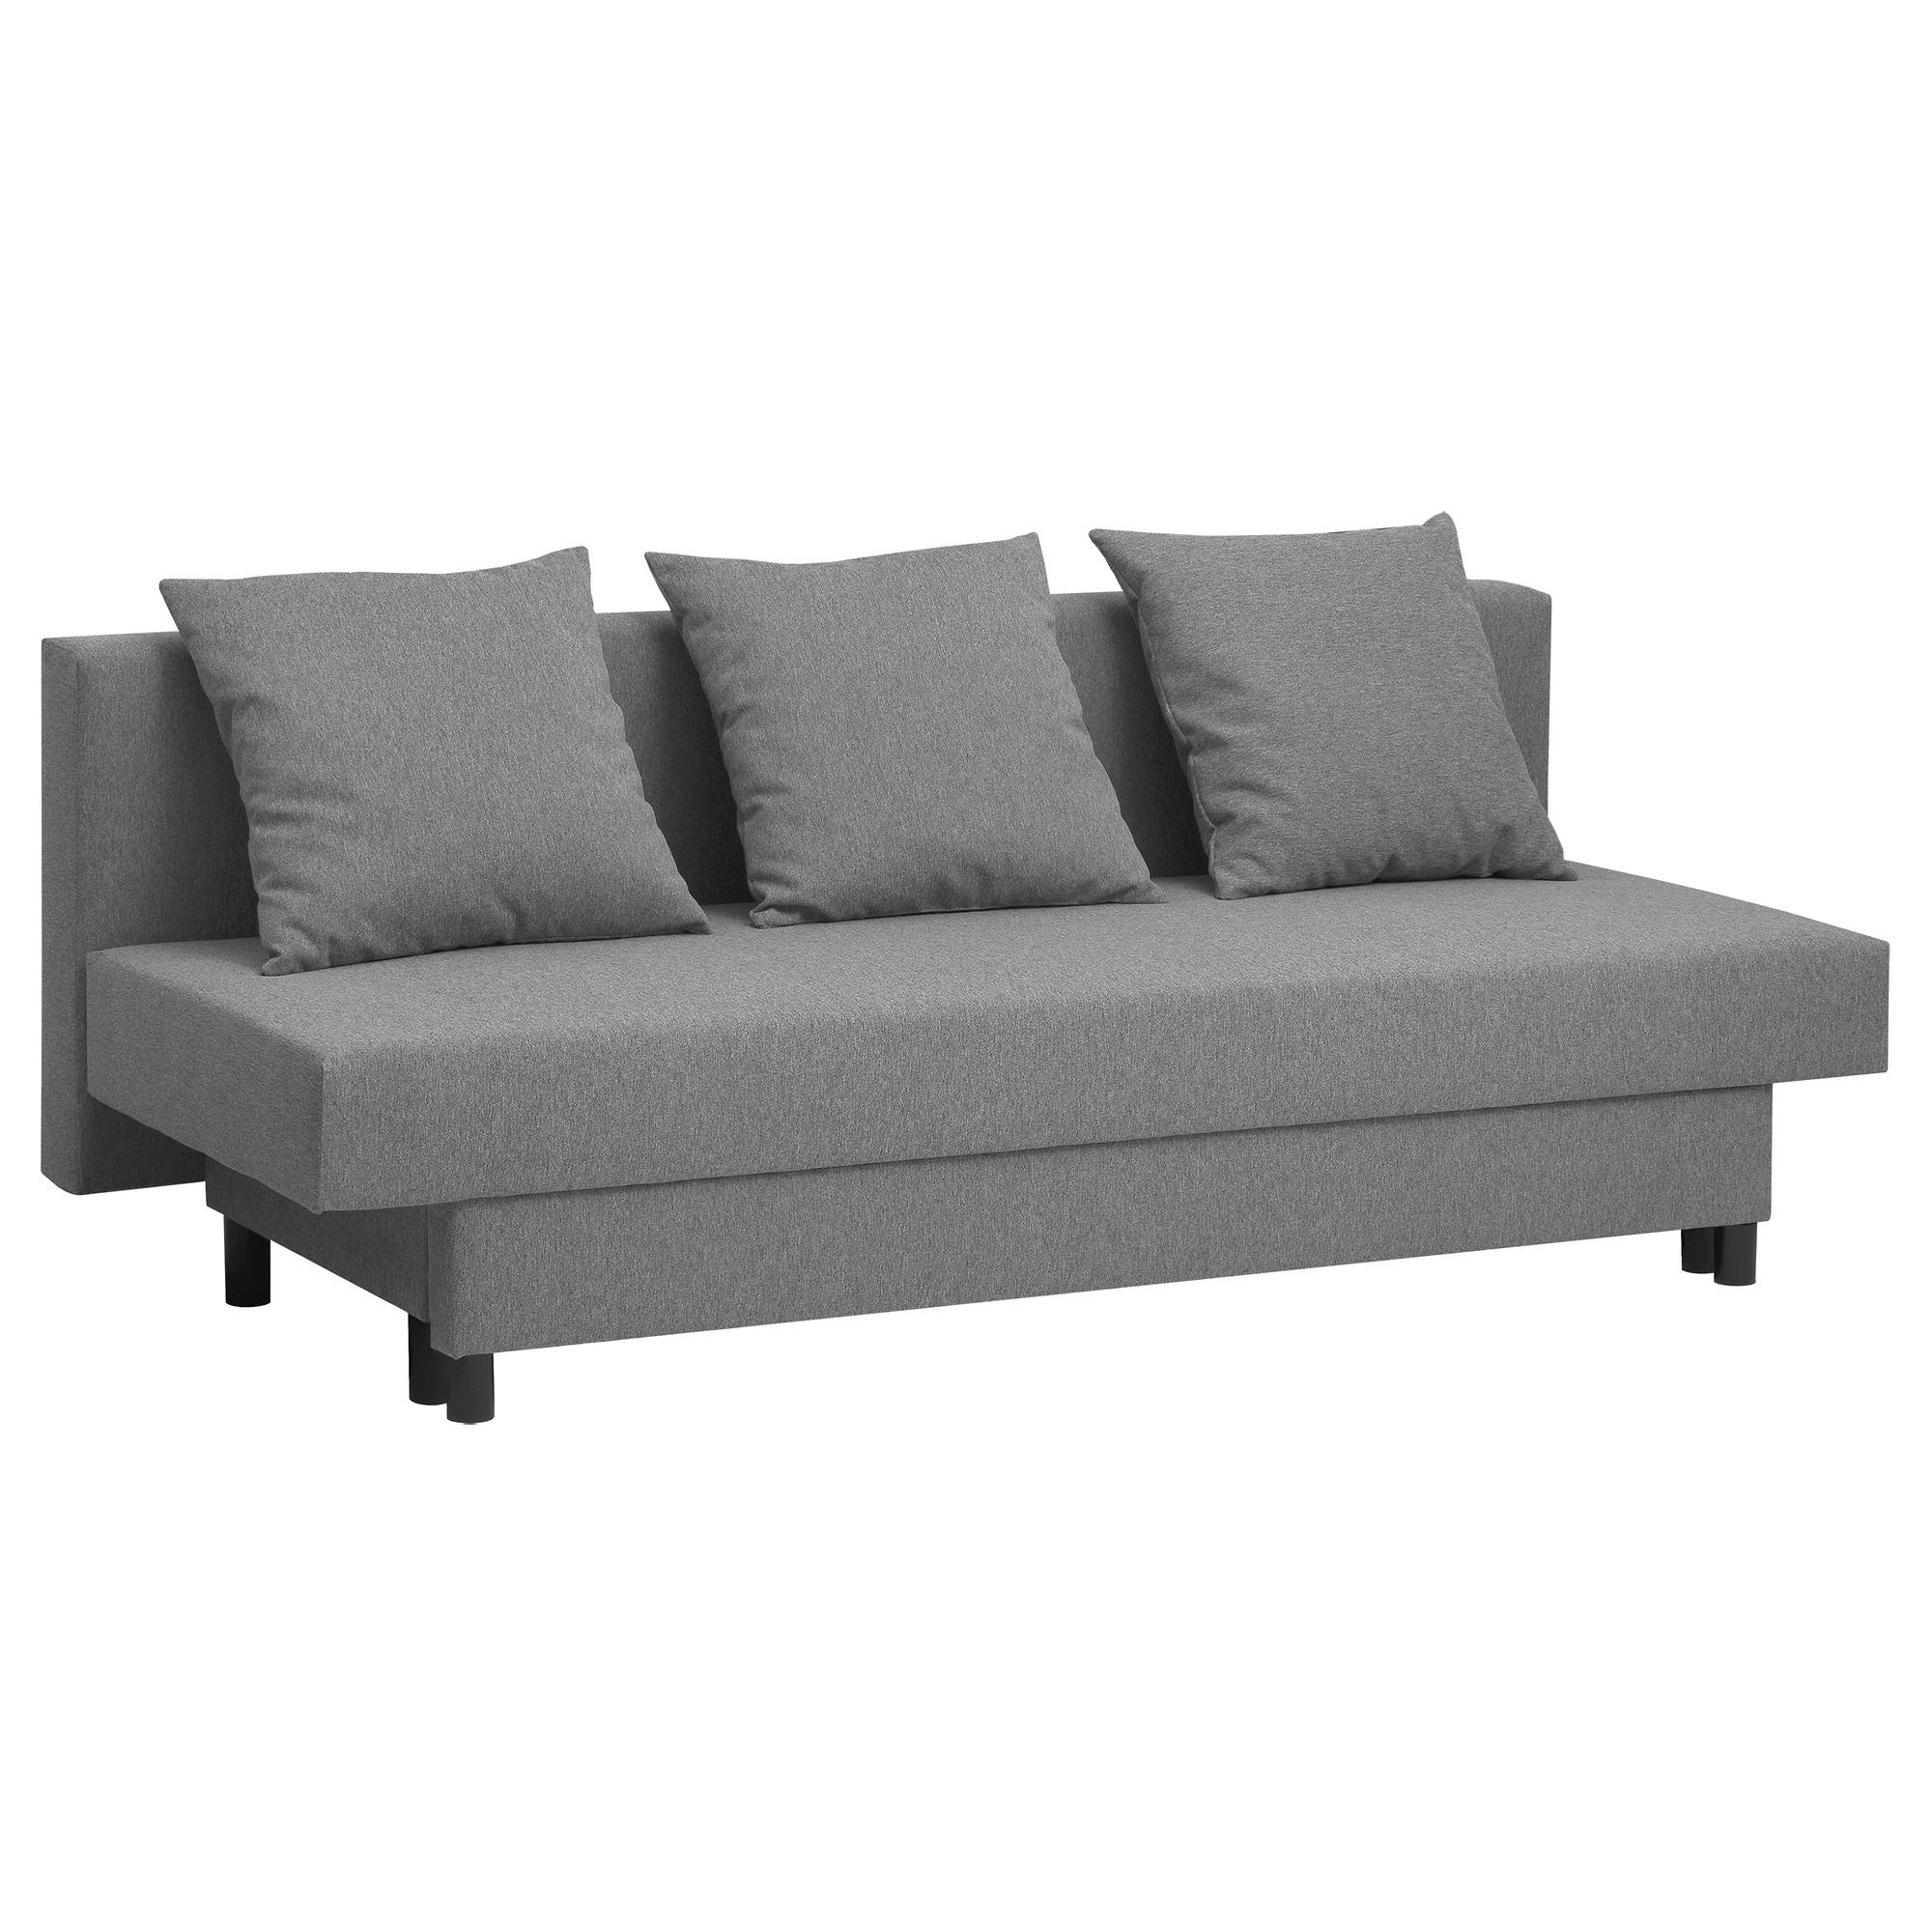 Ikea sofas Cama Y7du asarum Three Seat sofa Bed Grey Ikea